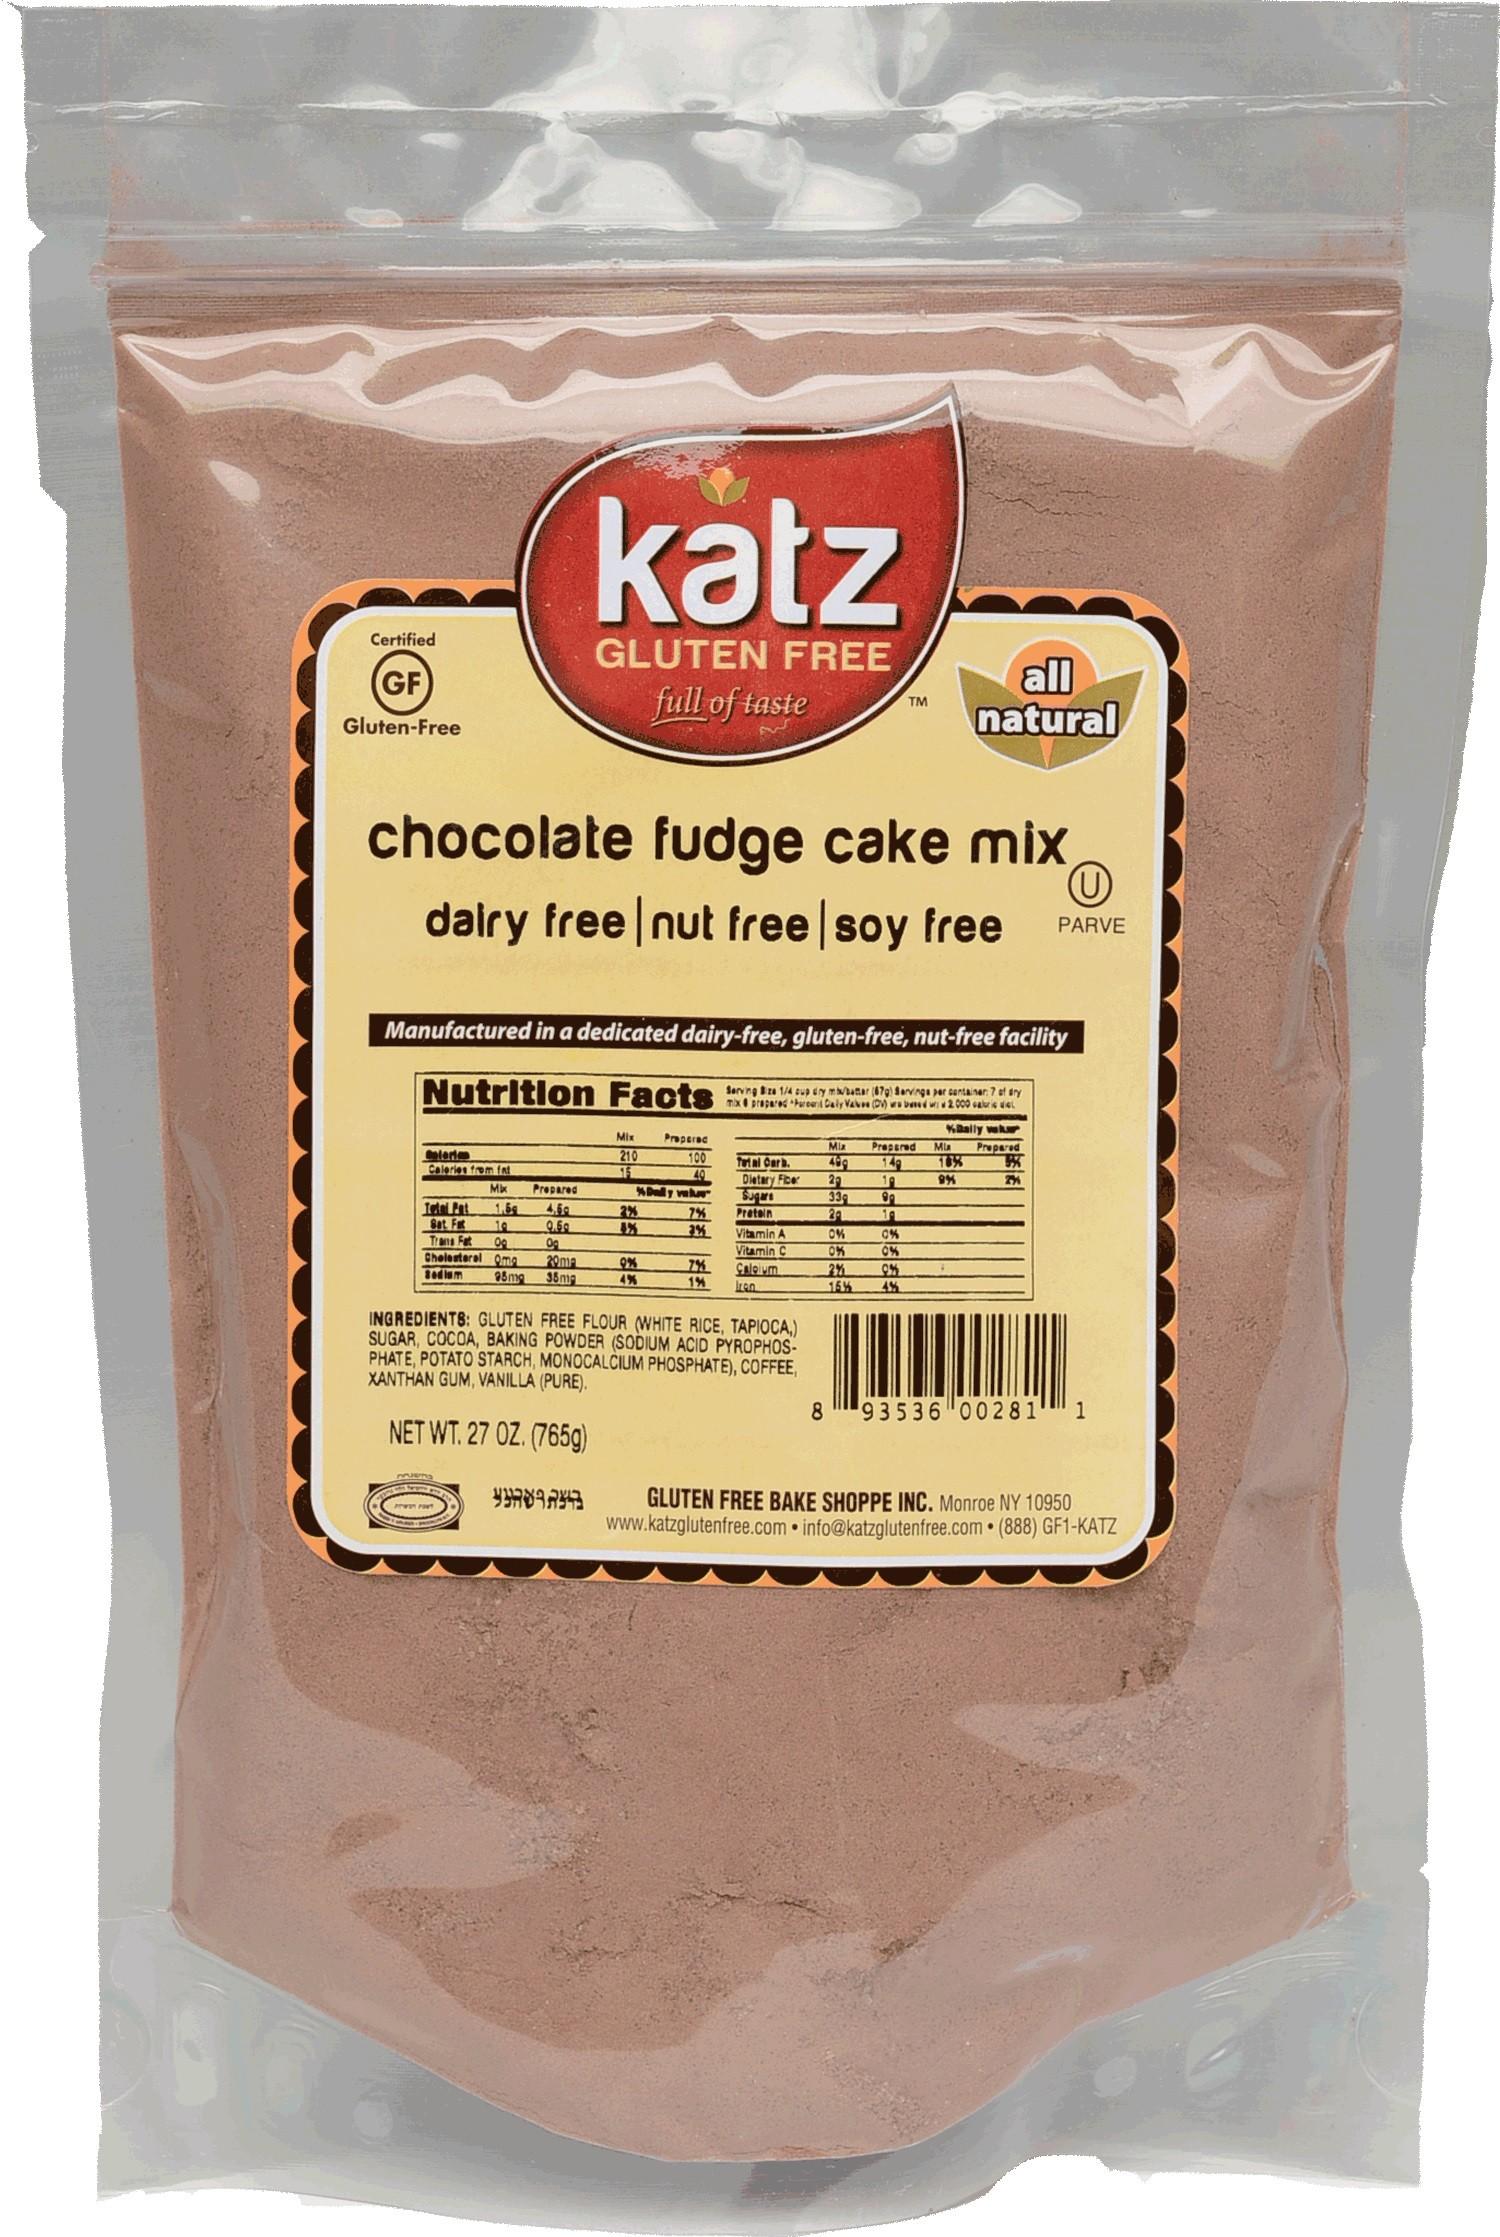 Katz Gluten Free Chocolate Fudge Cake Mix (Case of 6)